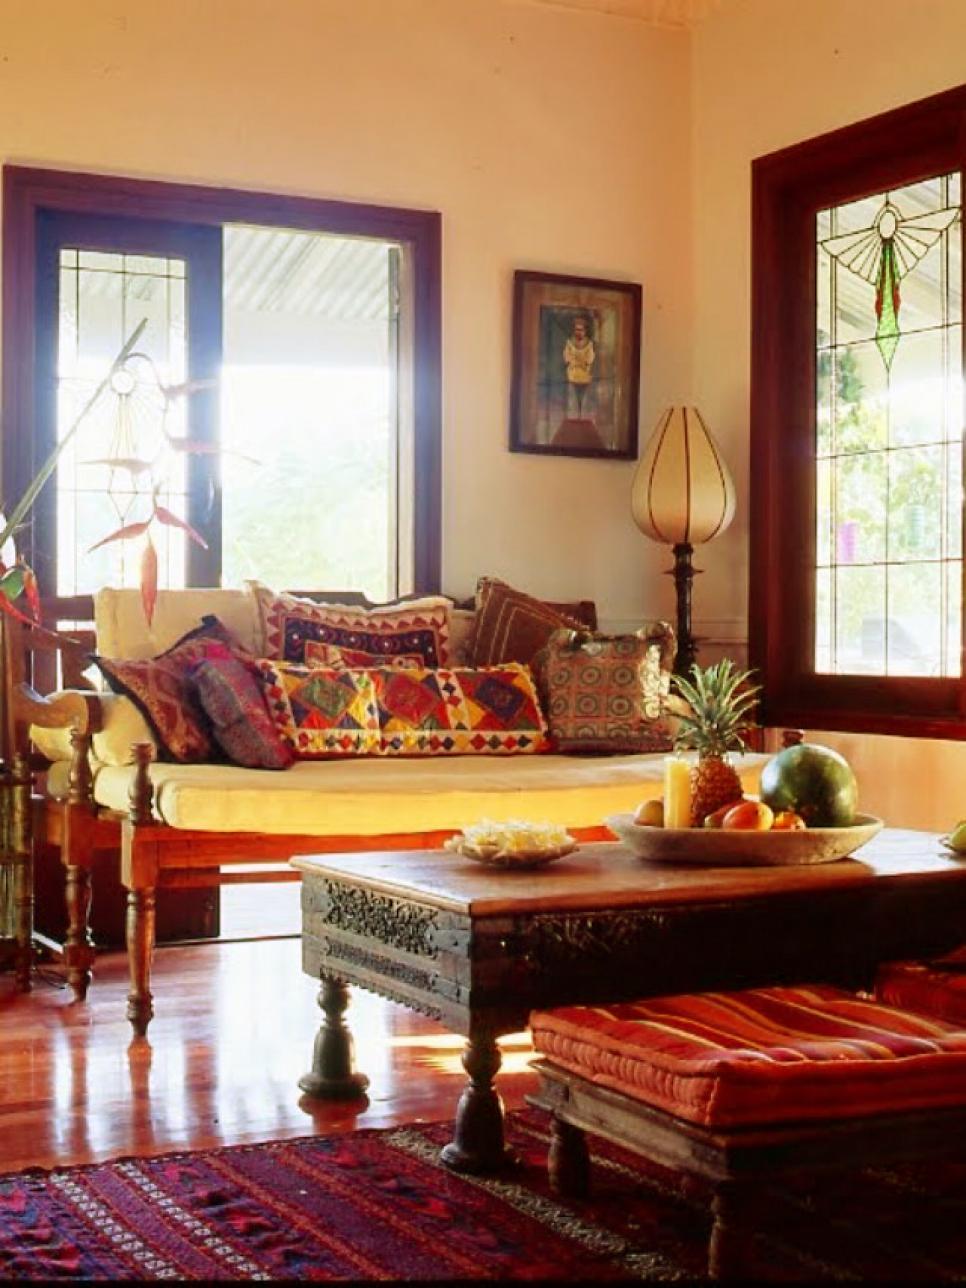 Furniture-indian-interior-design Top 10 Indian Interior Design Trends for 2020